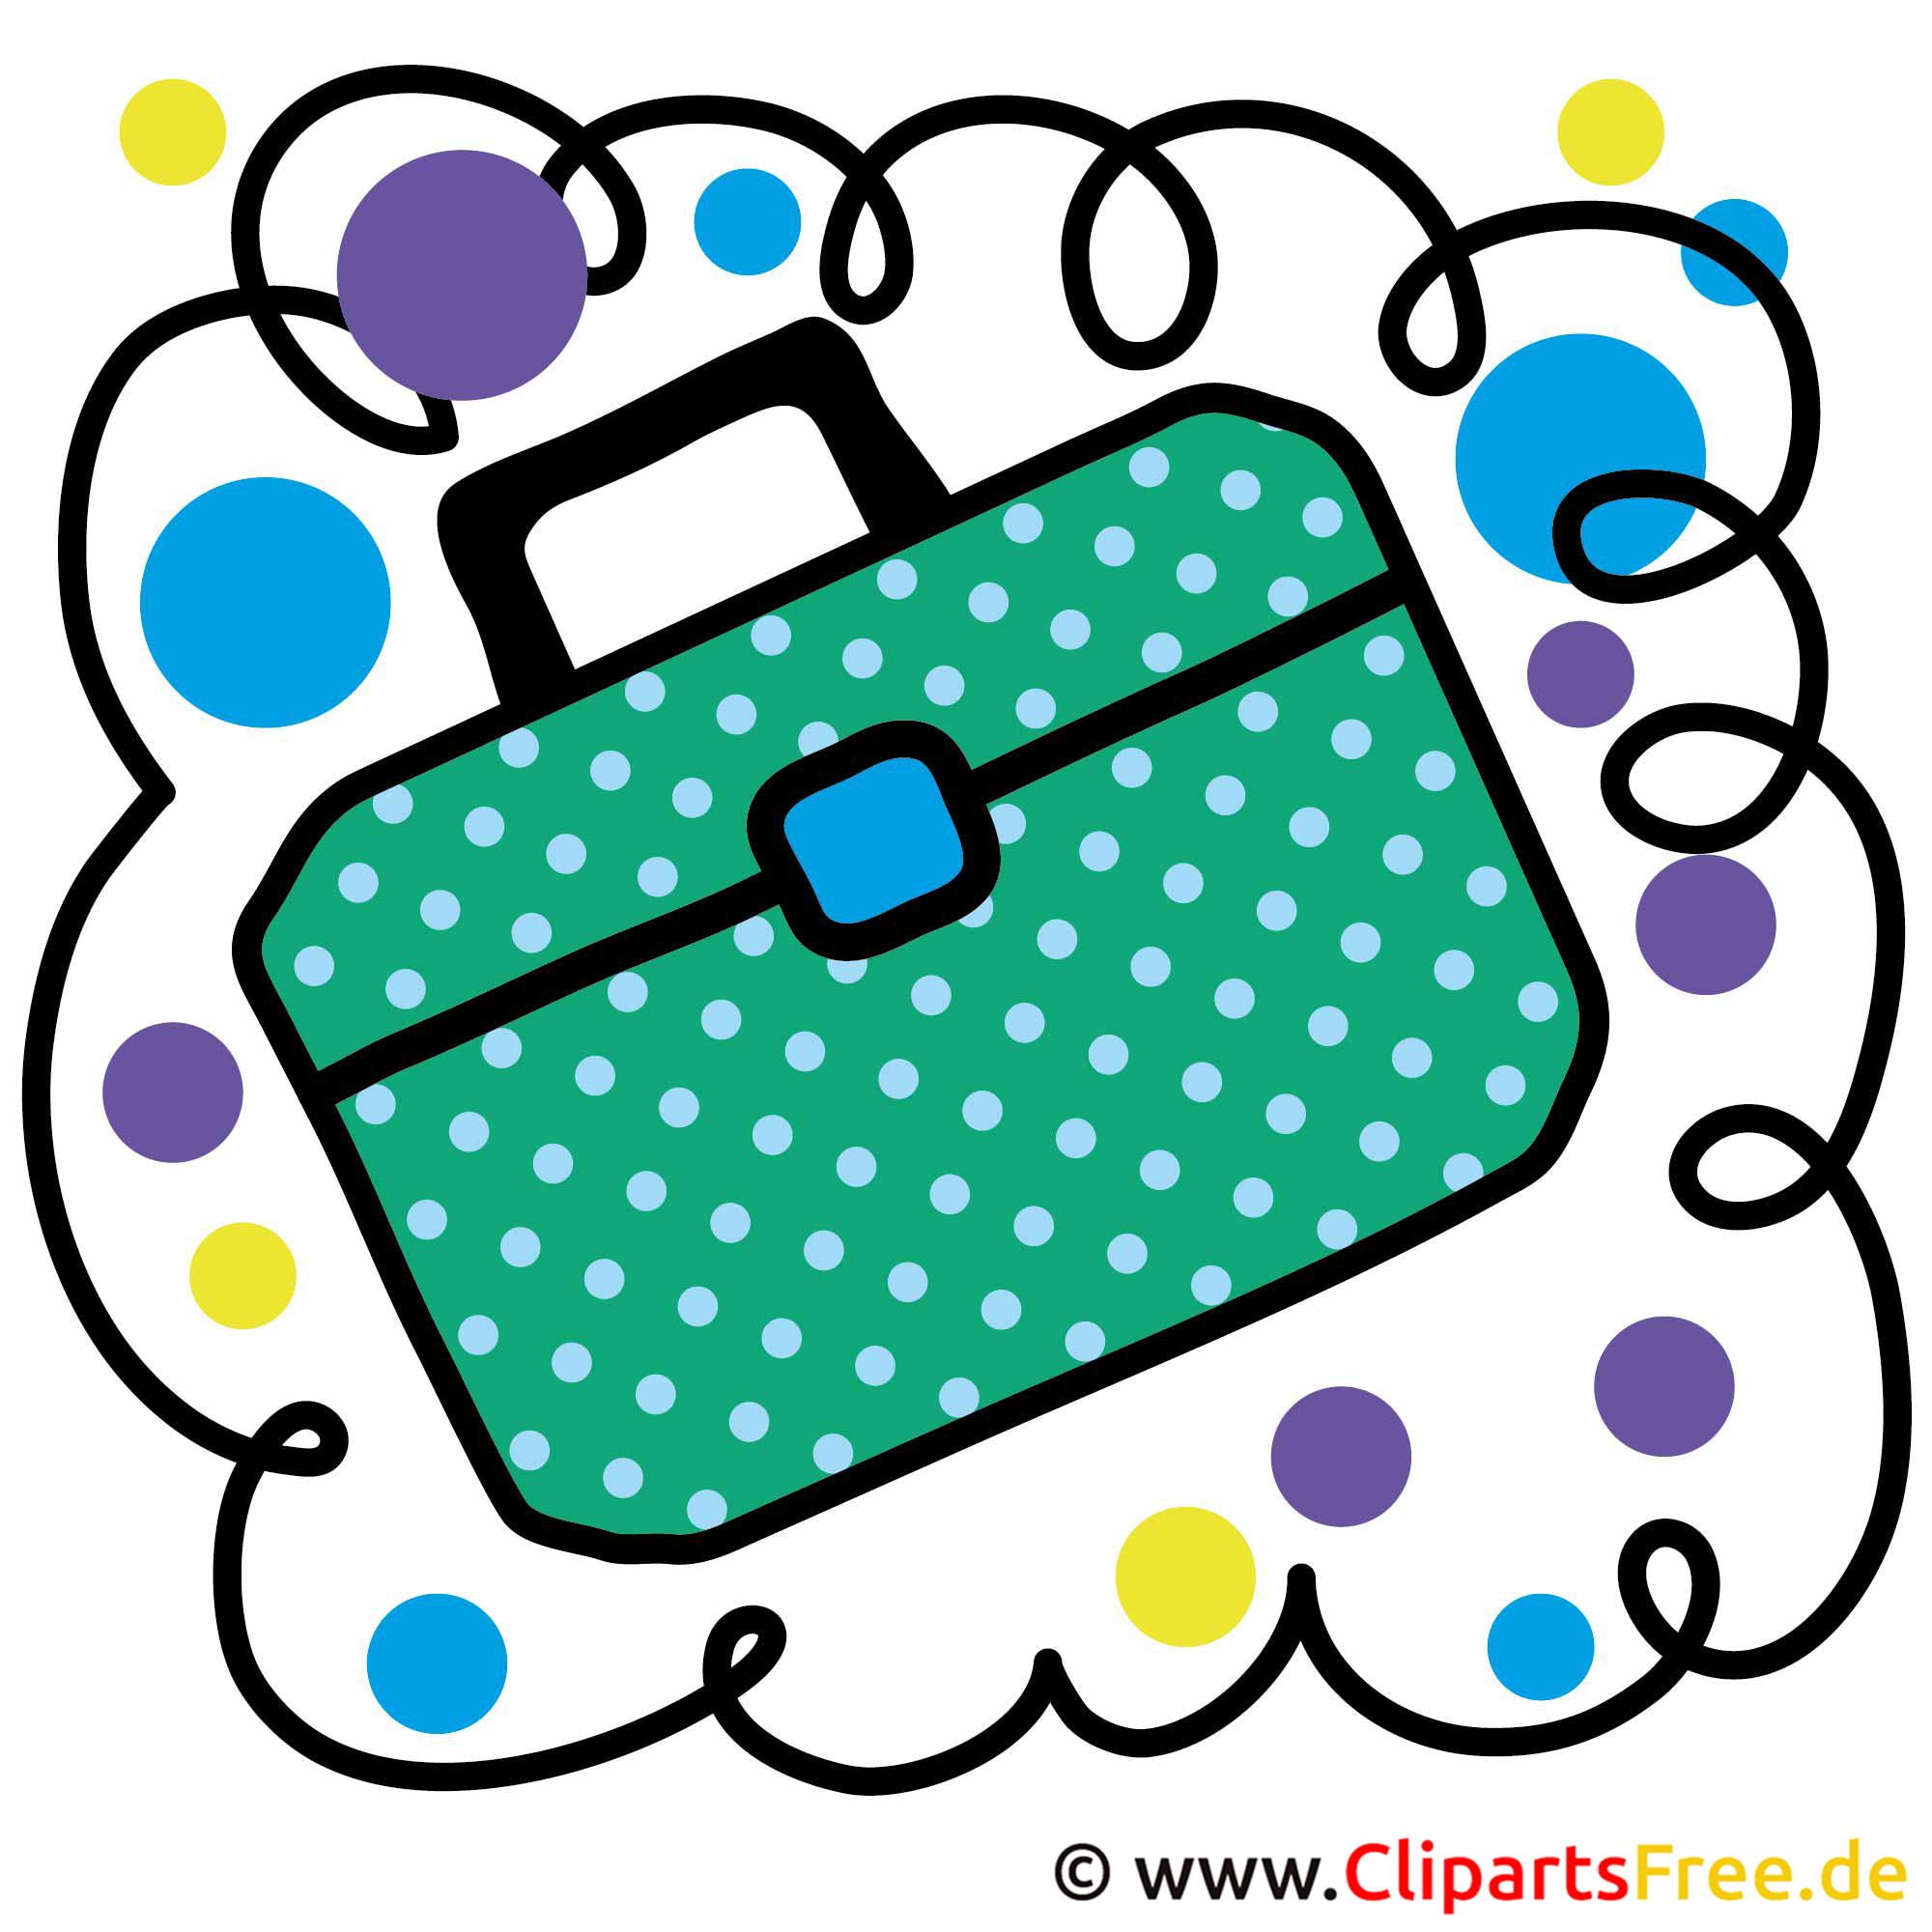 Schule Clip Arts free - Schultasche Bild